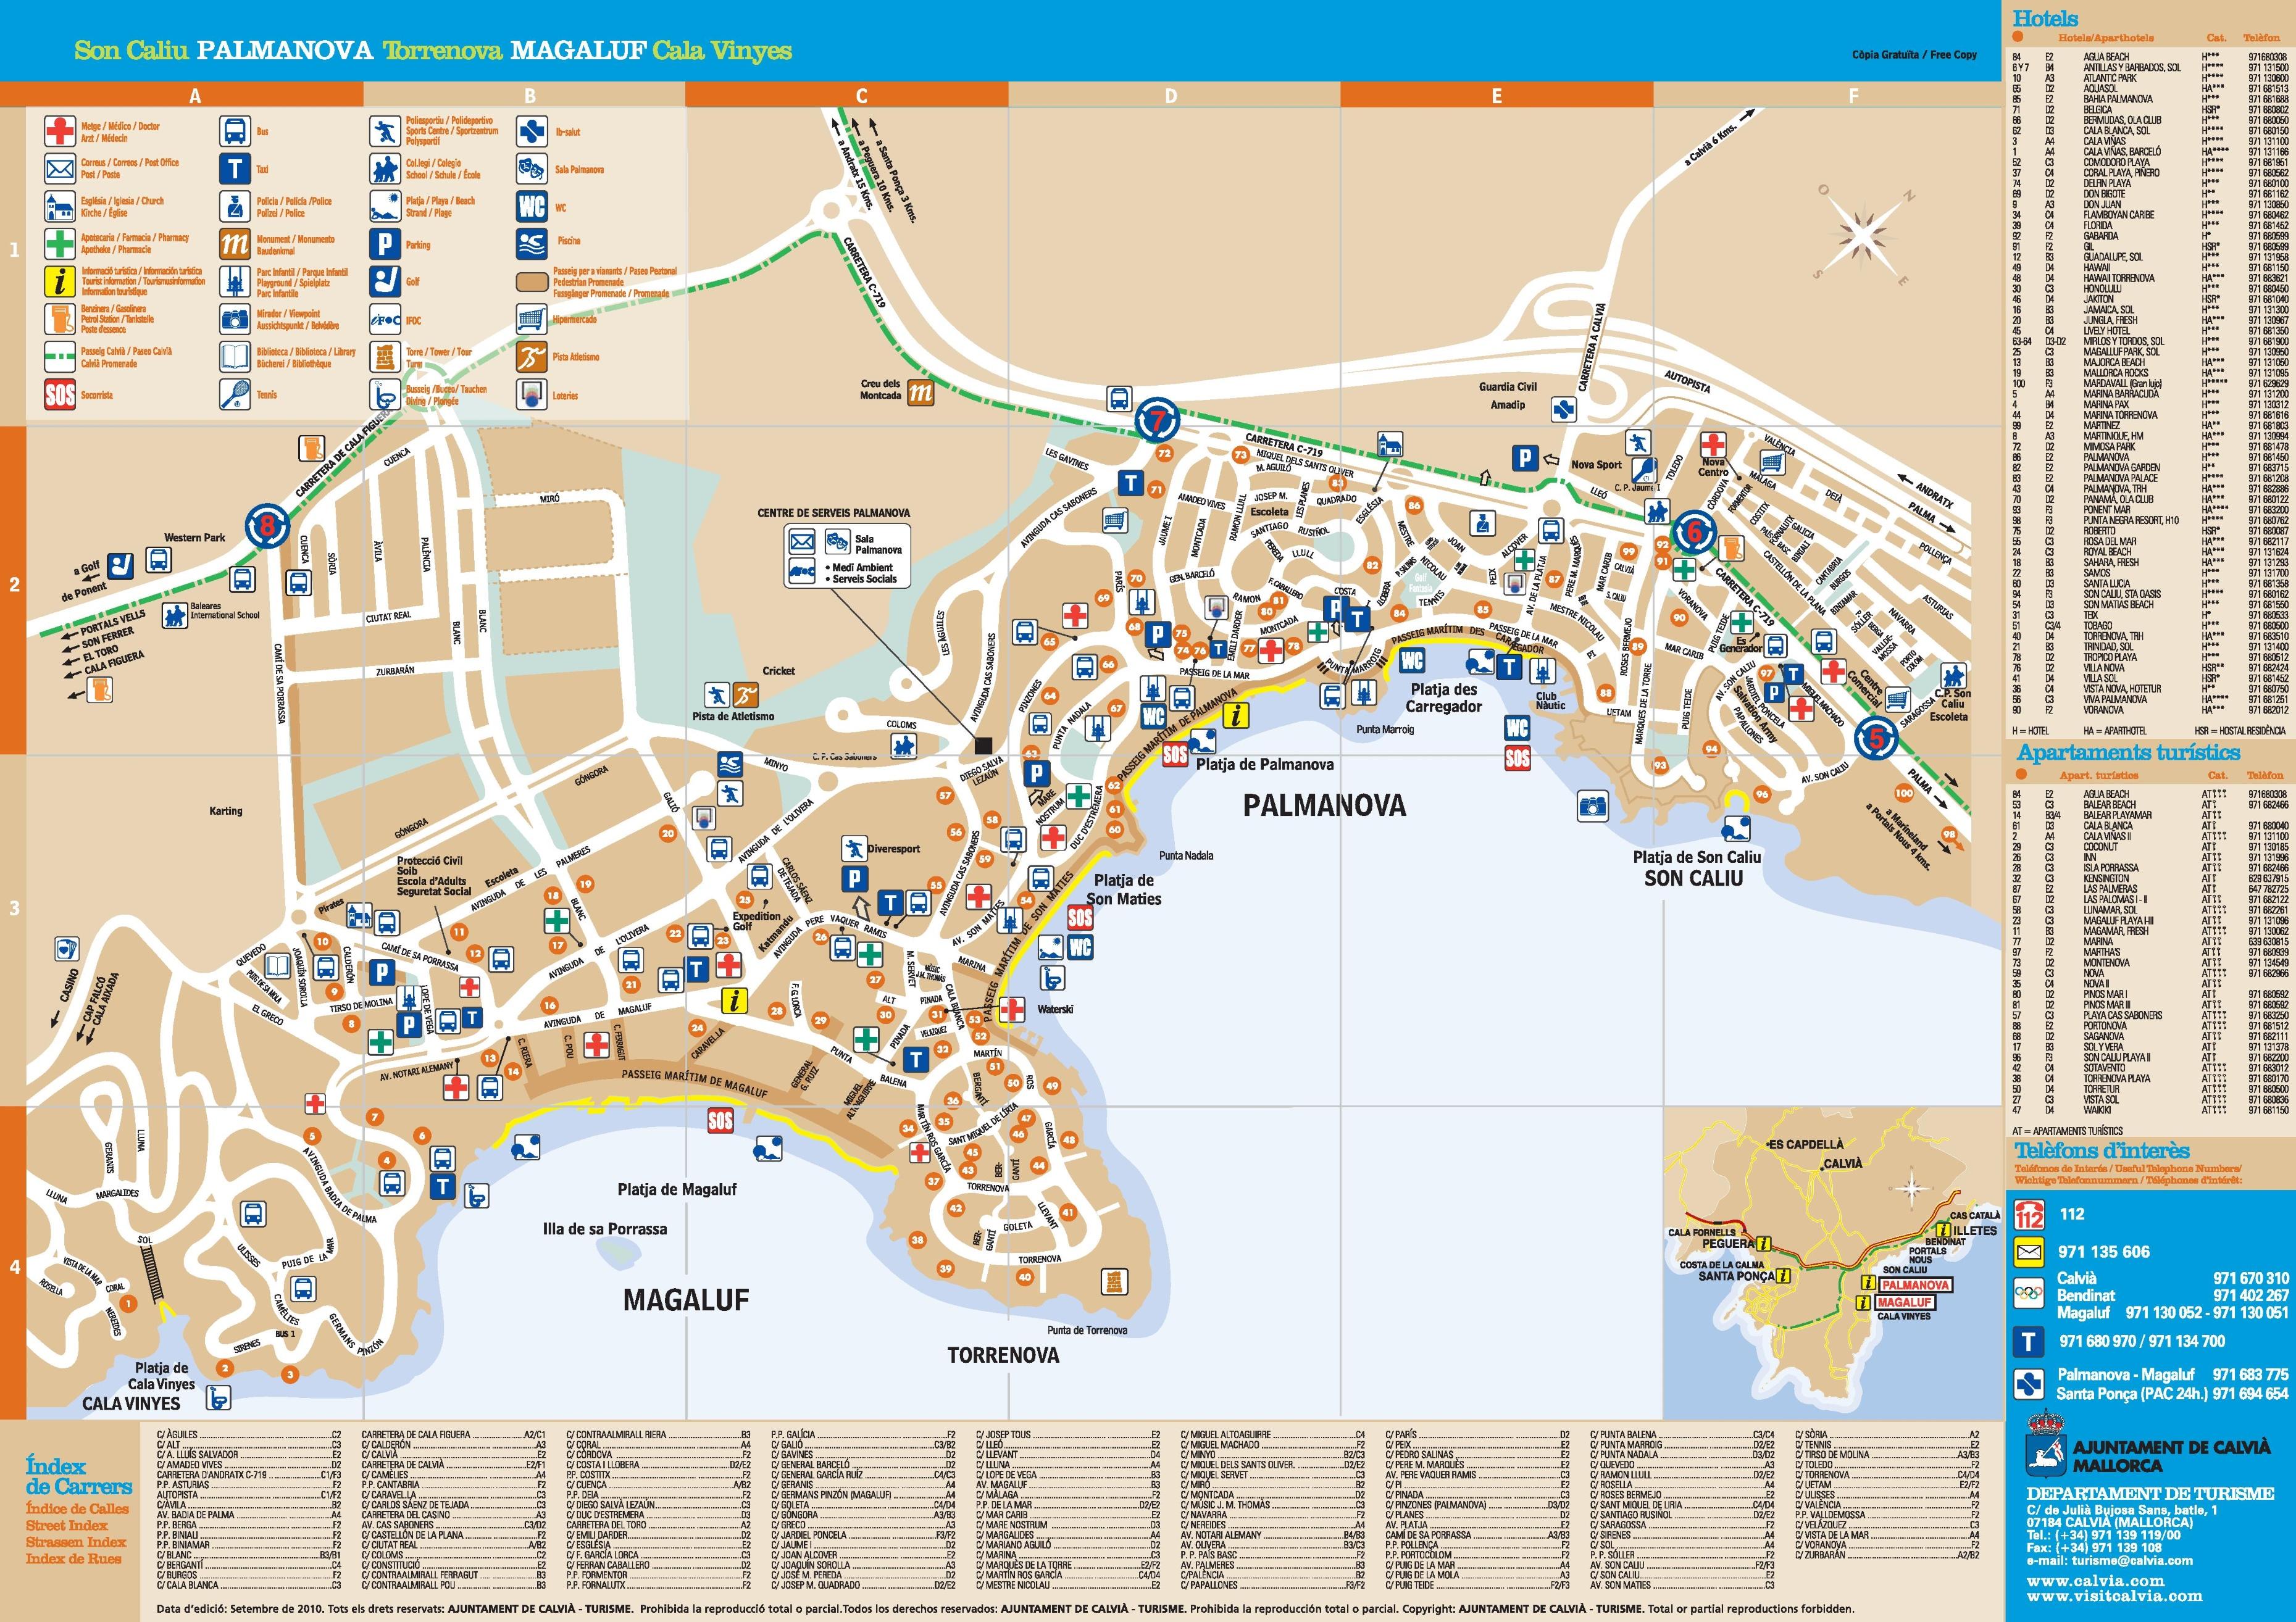 Map Of Magaluf Magaluf and Palma Nova hotel map